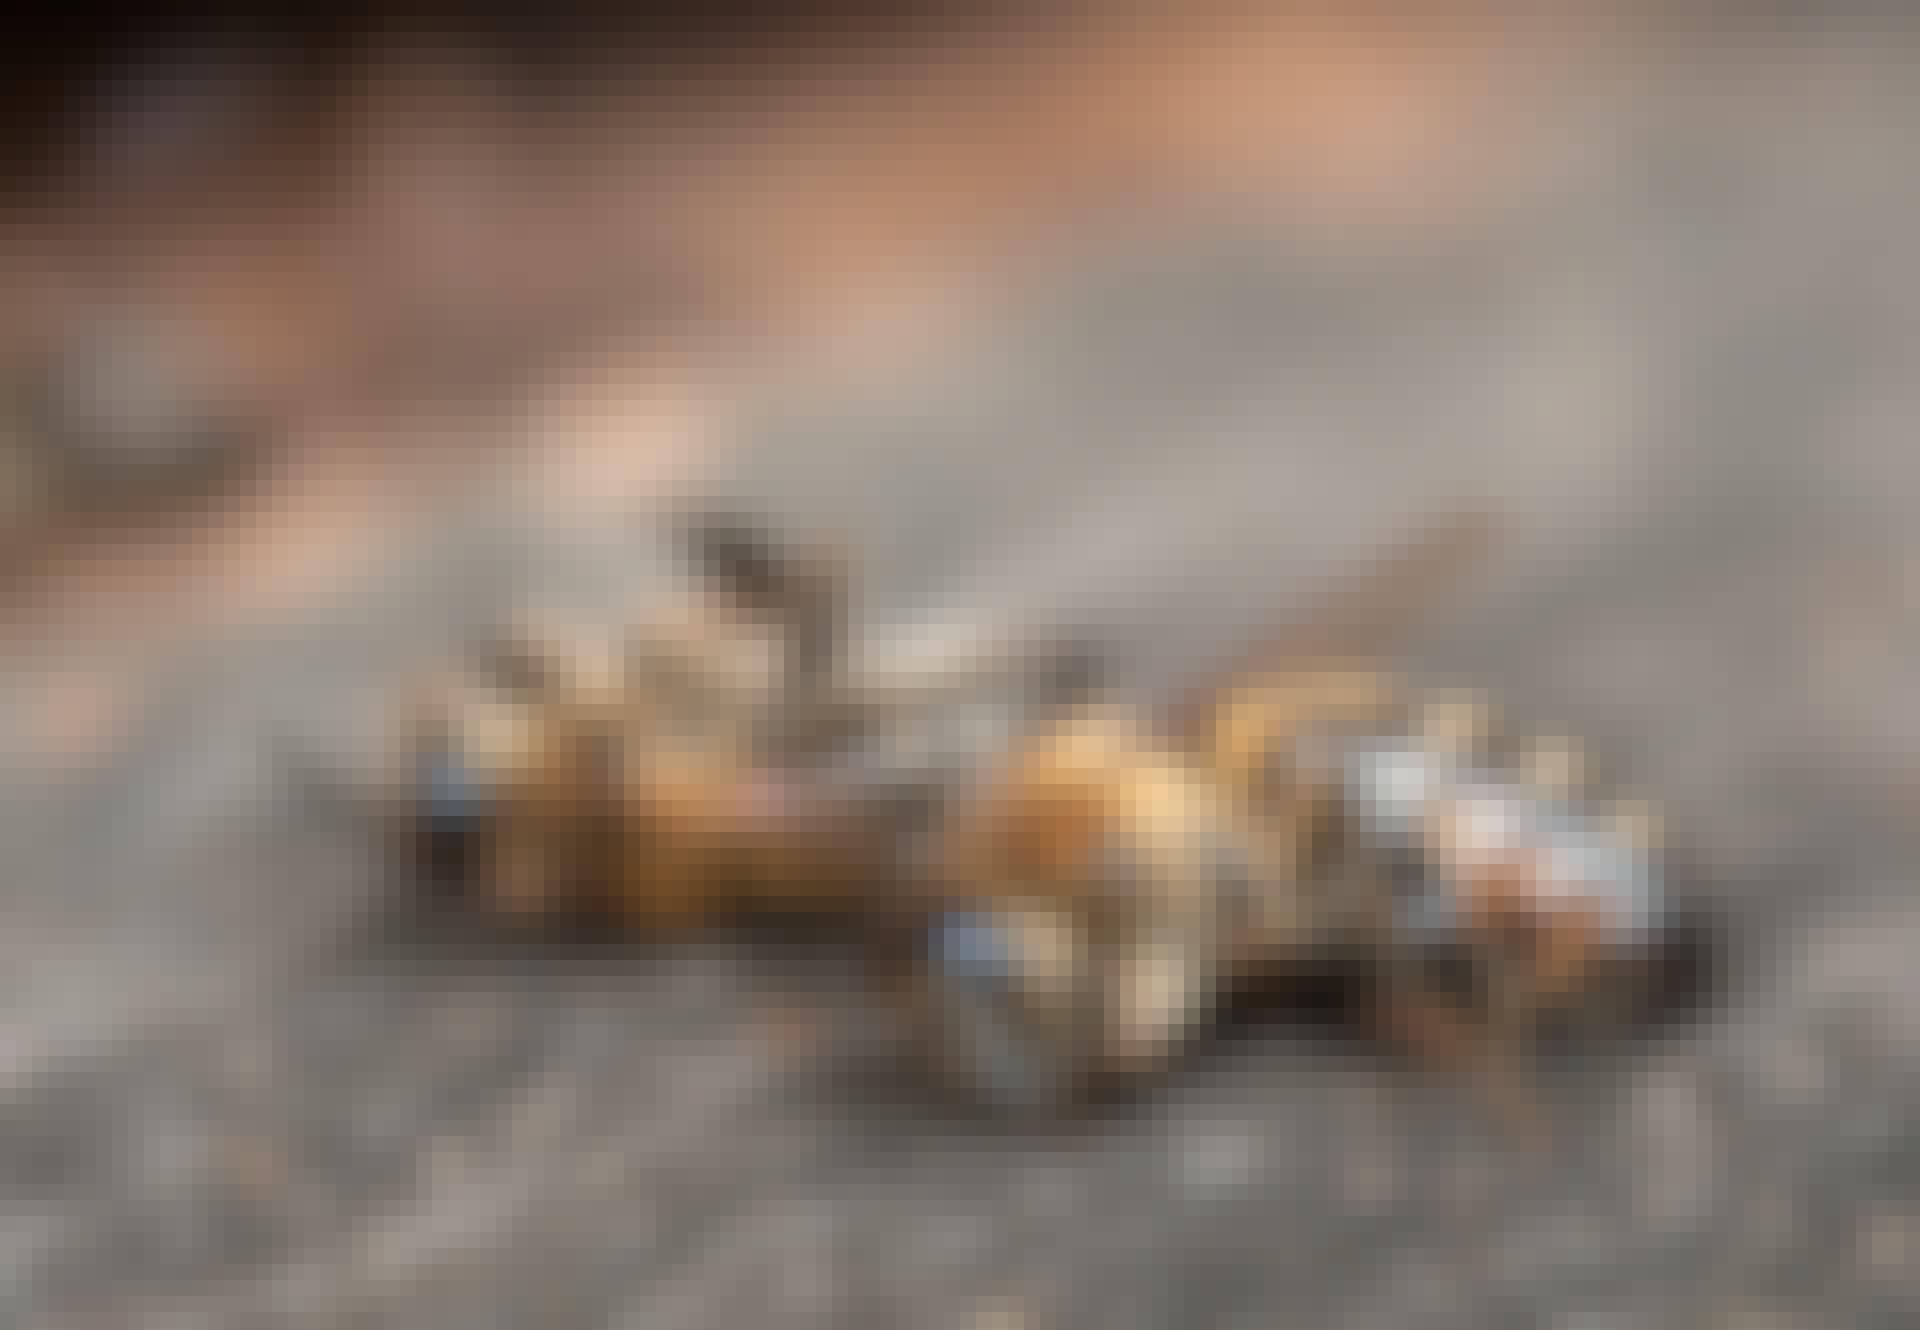 Bierne dør